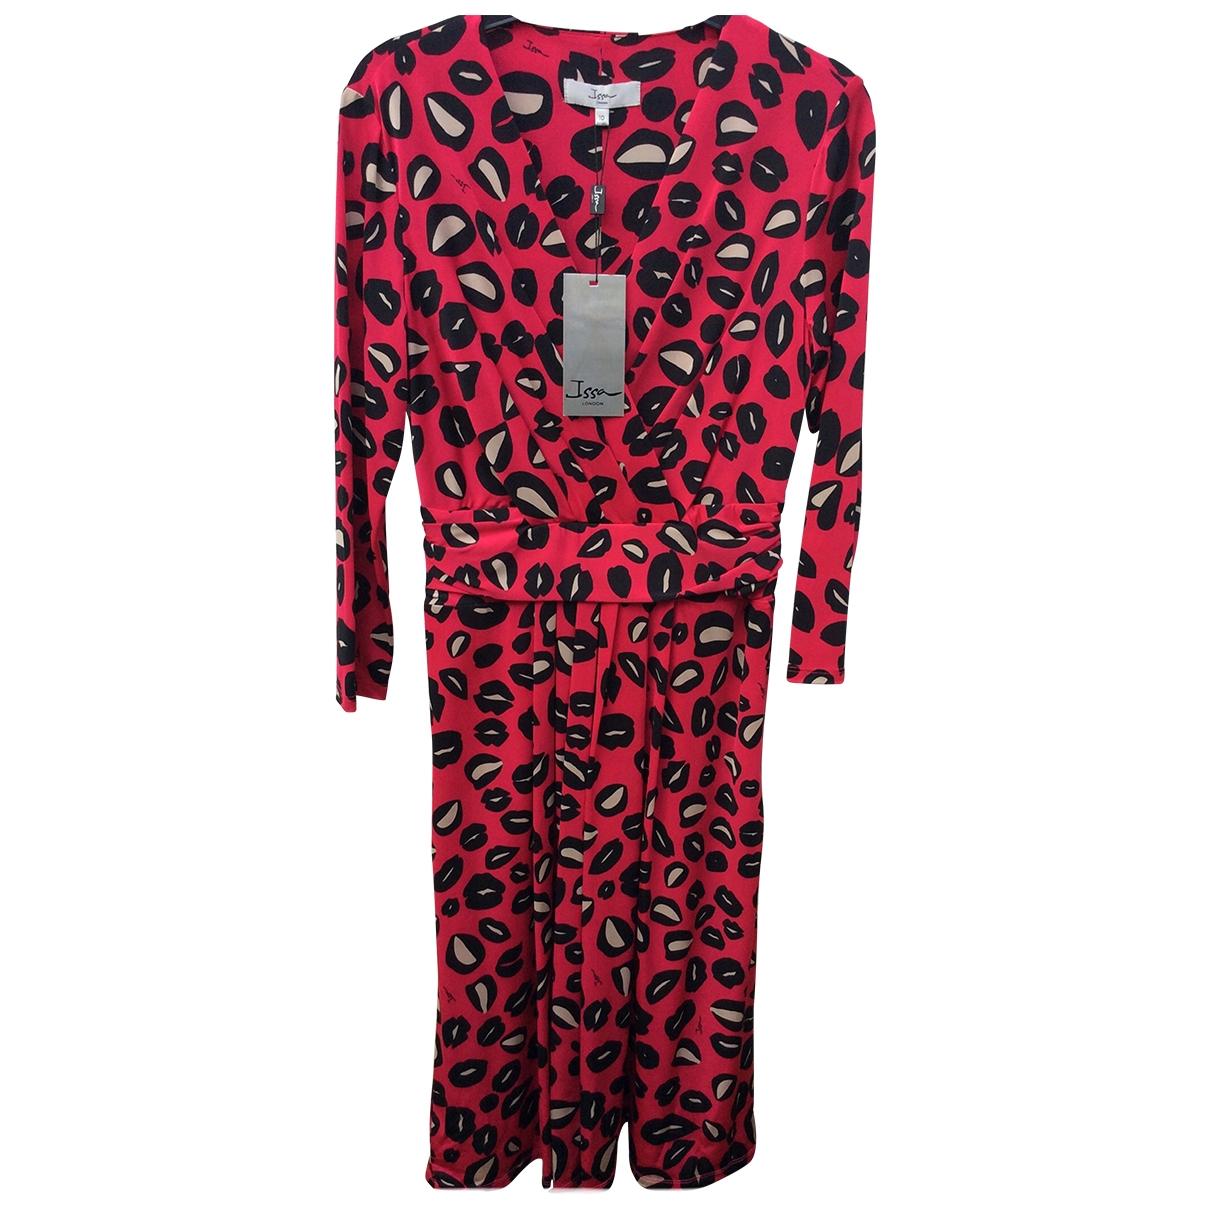 Issa \N Pink dress for Women 10 UK